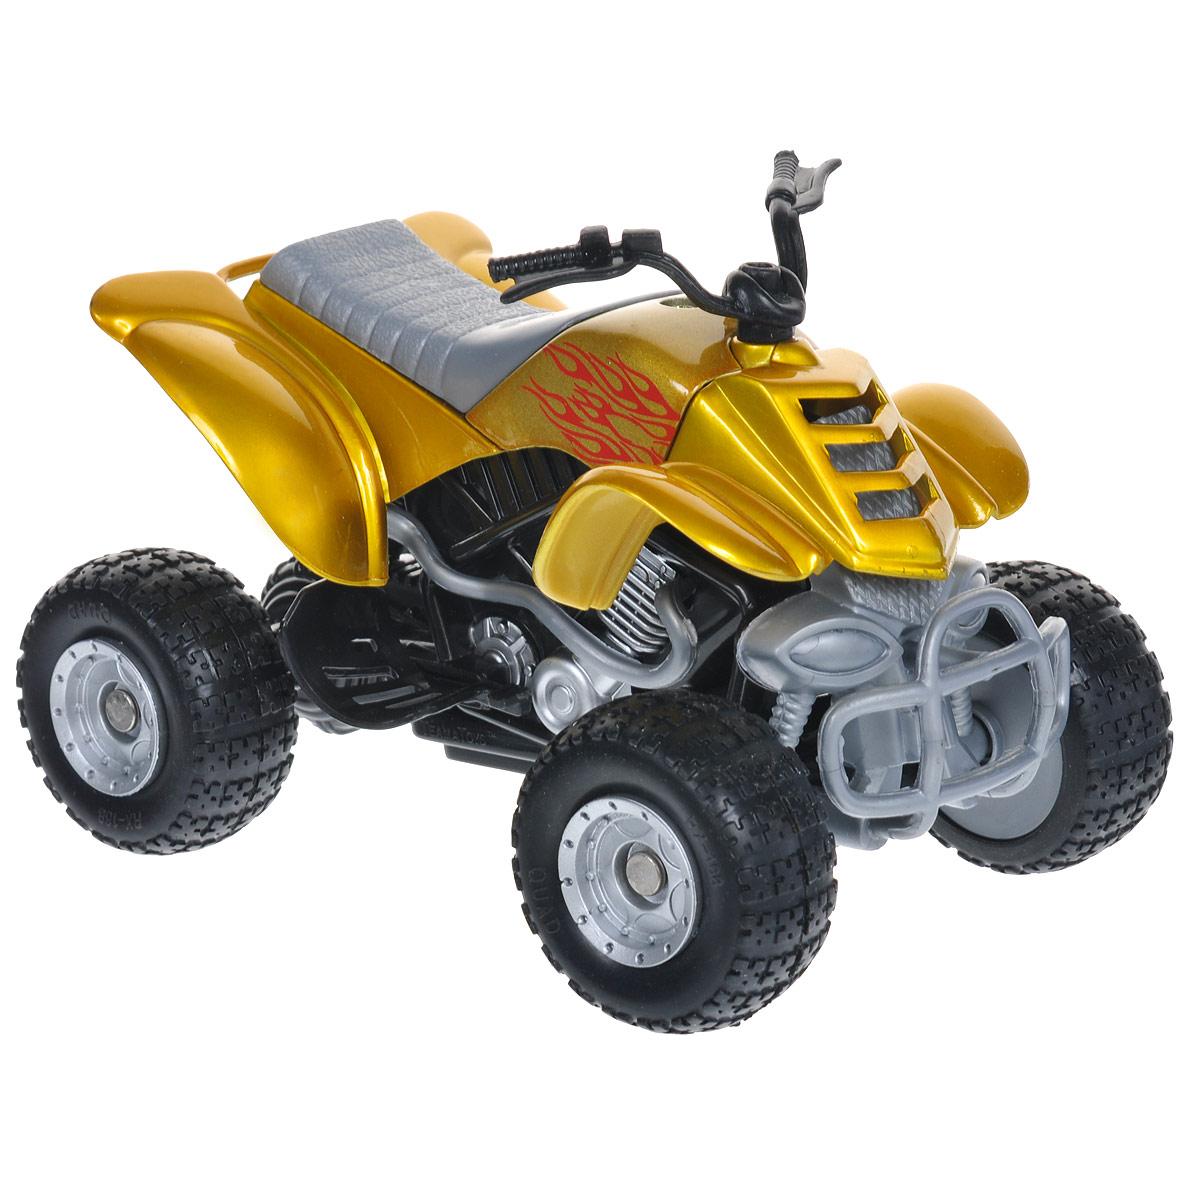 Autotime Коллекционная модель Мотоцикл Quadrobike Fire, цвет: желтый для квадроцикла